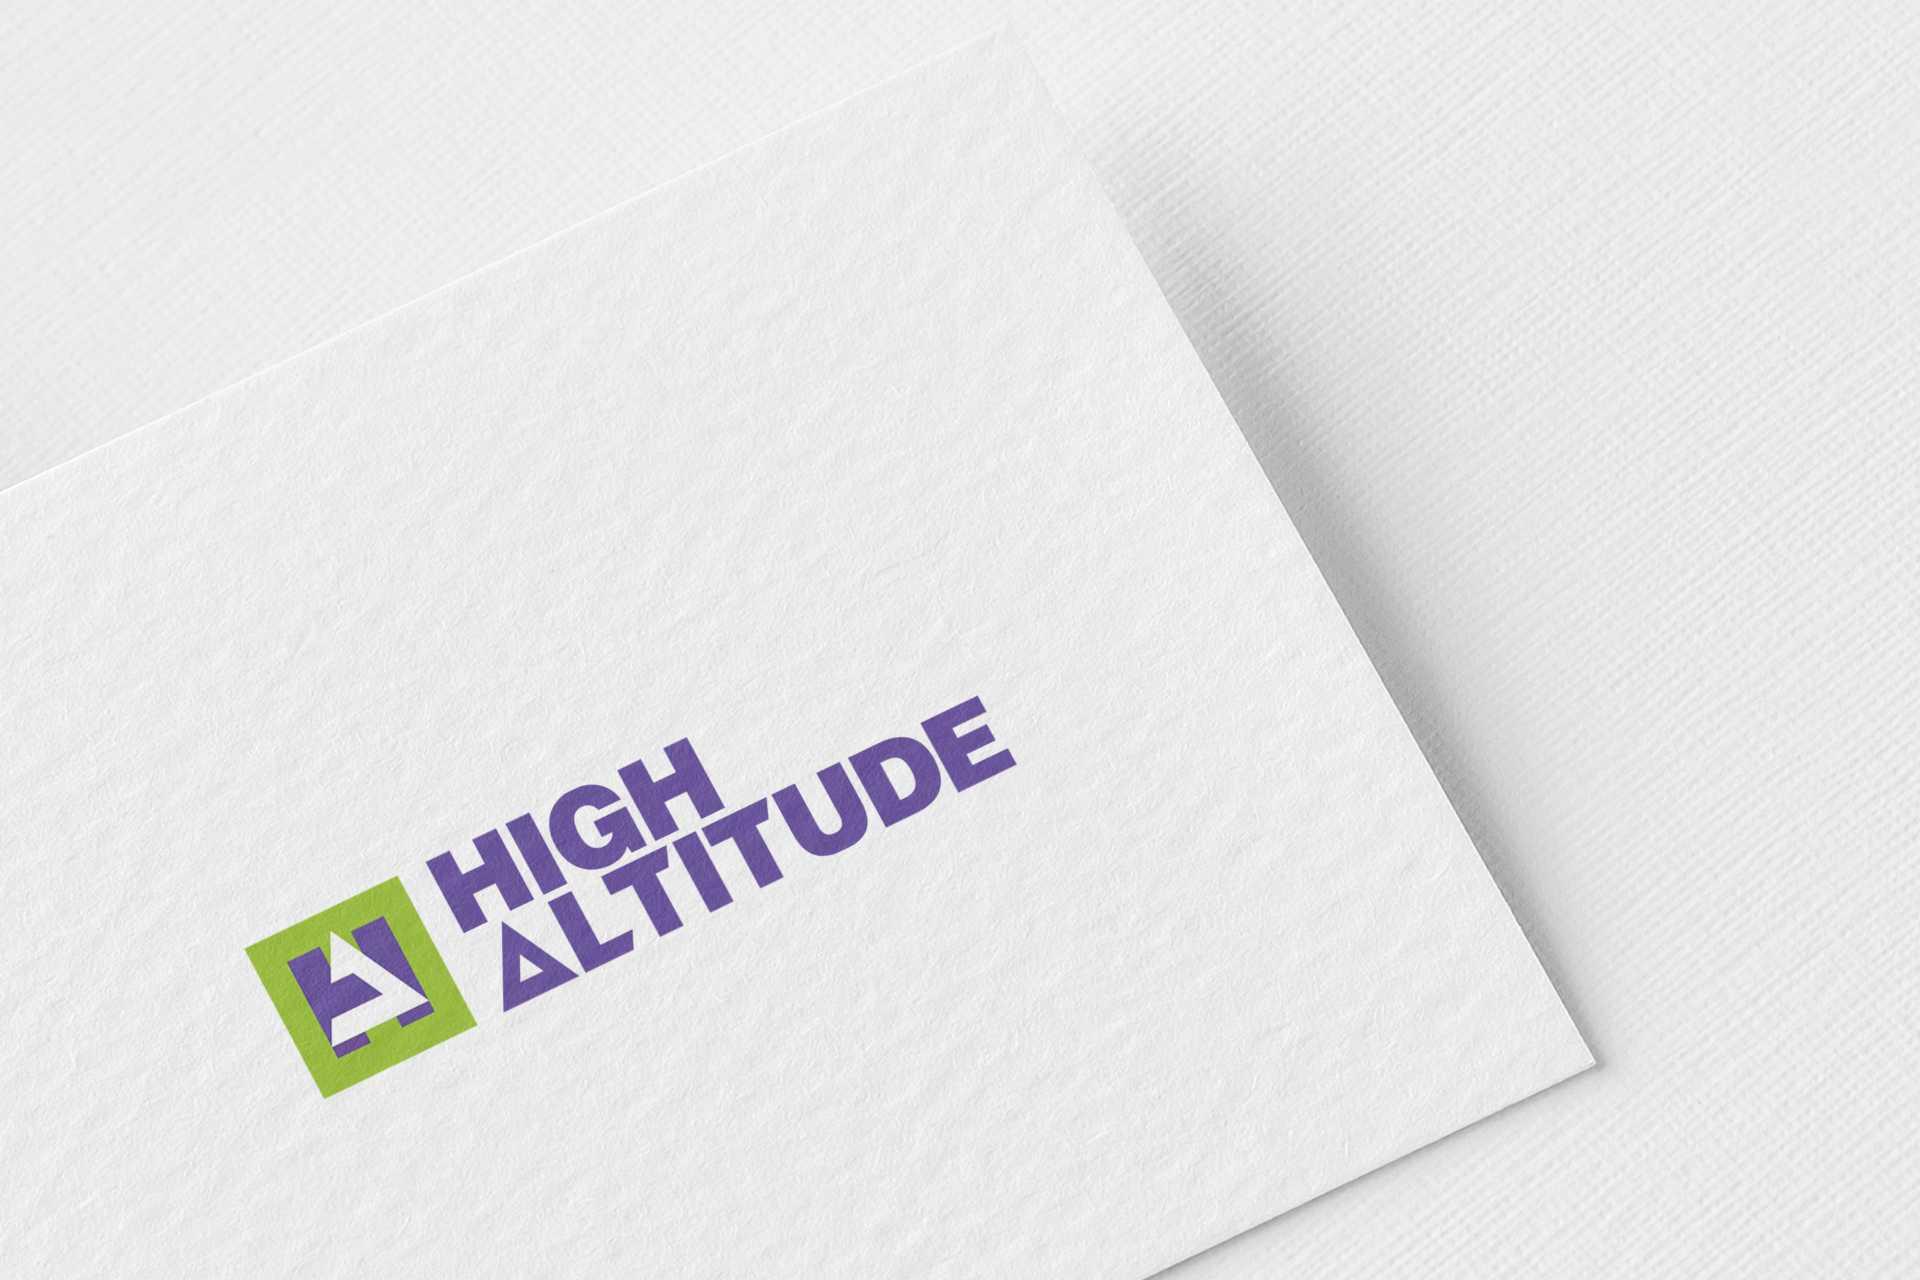 pixel-perfect-warrington-high-altitude-norwich-logo-design